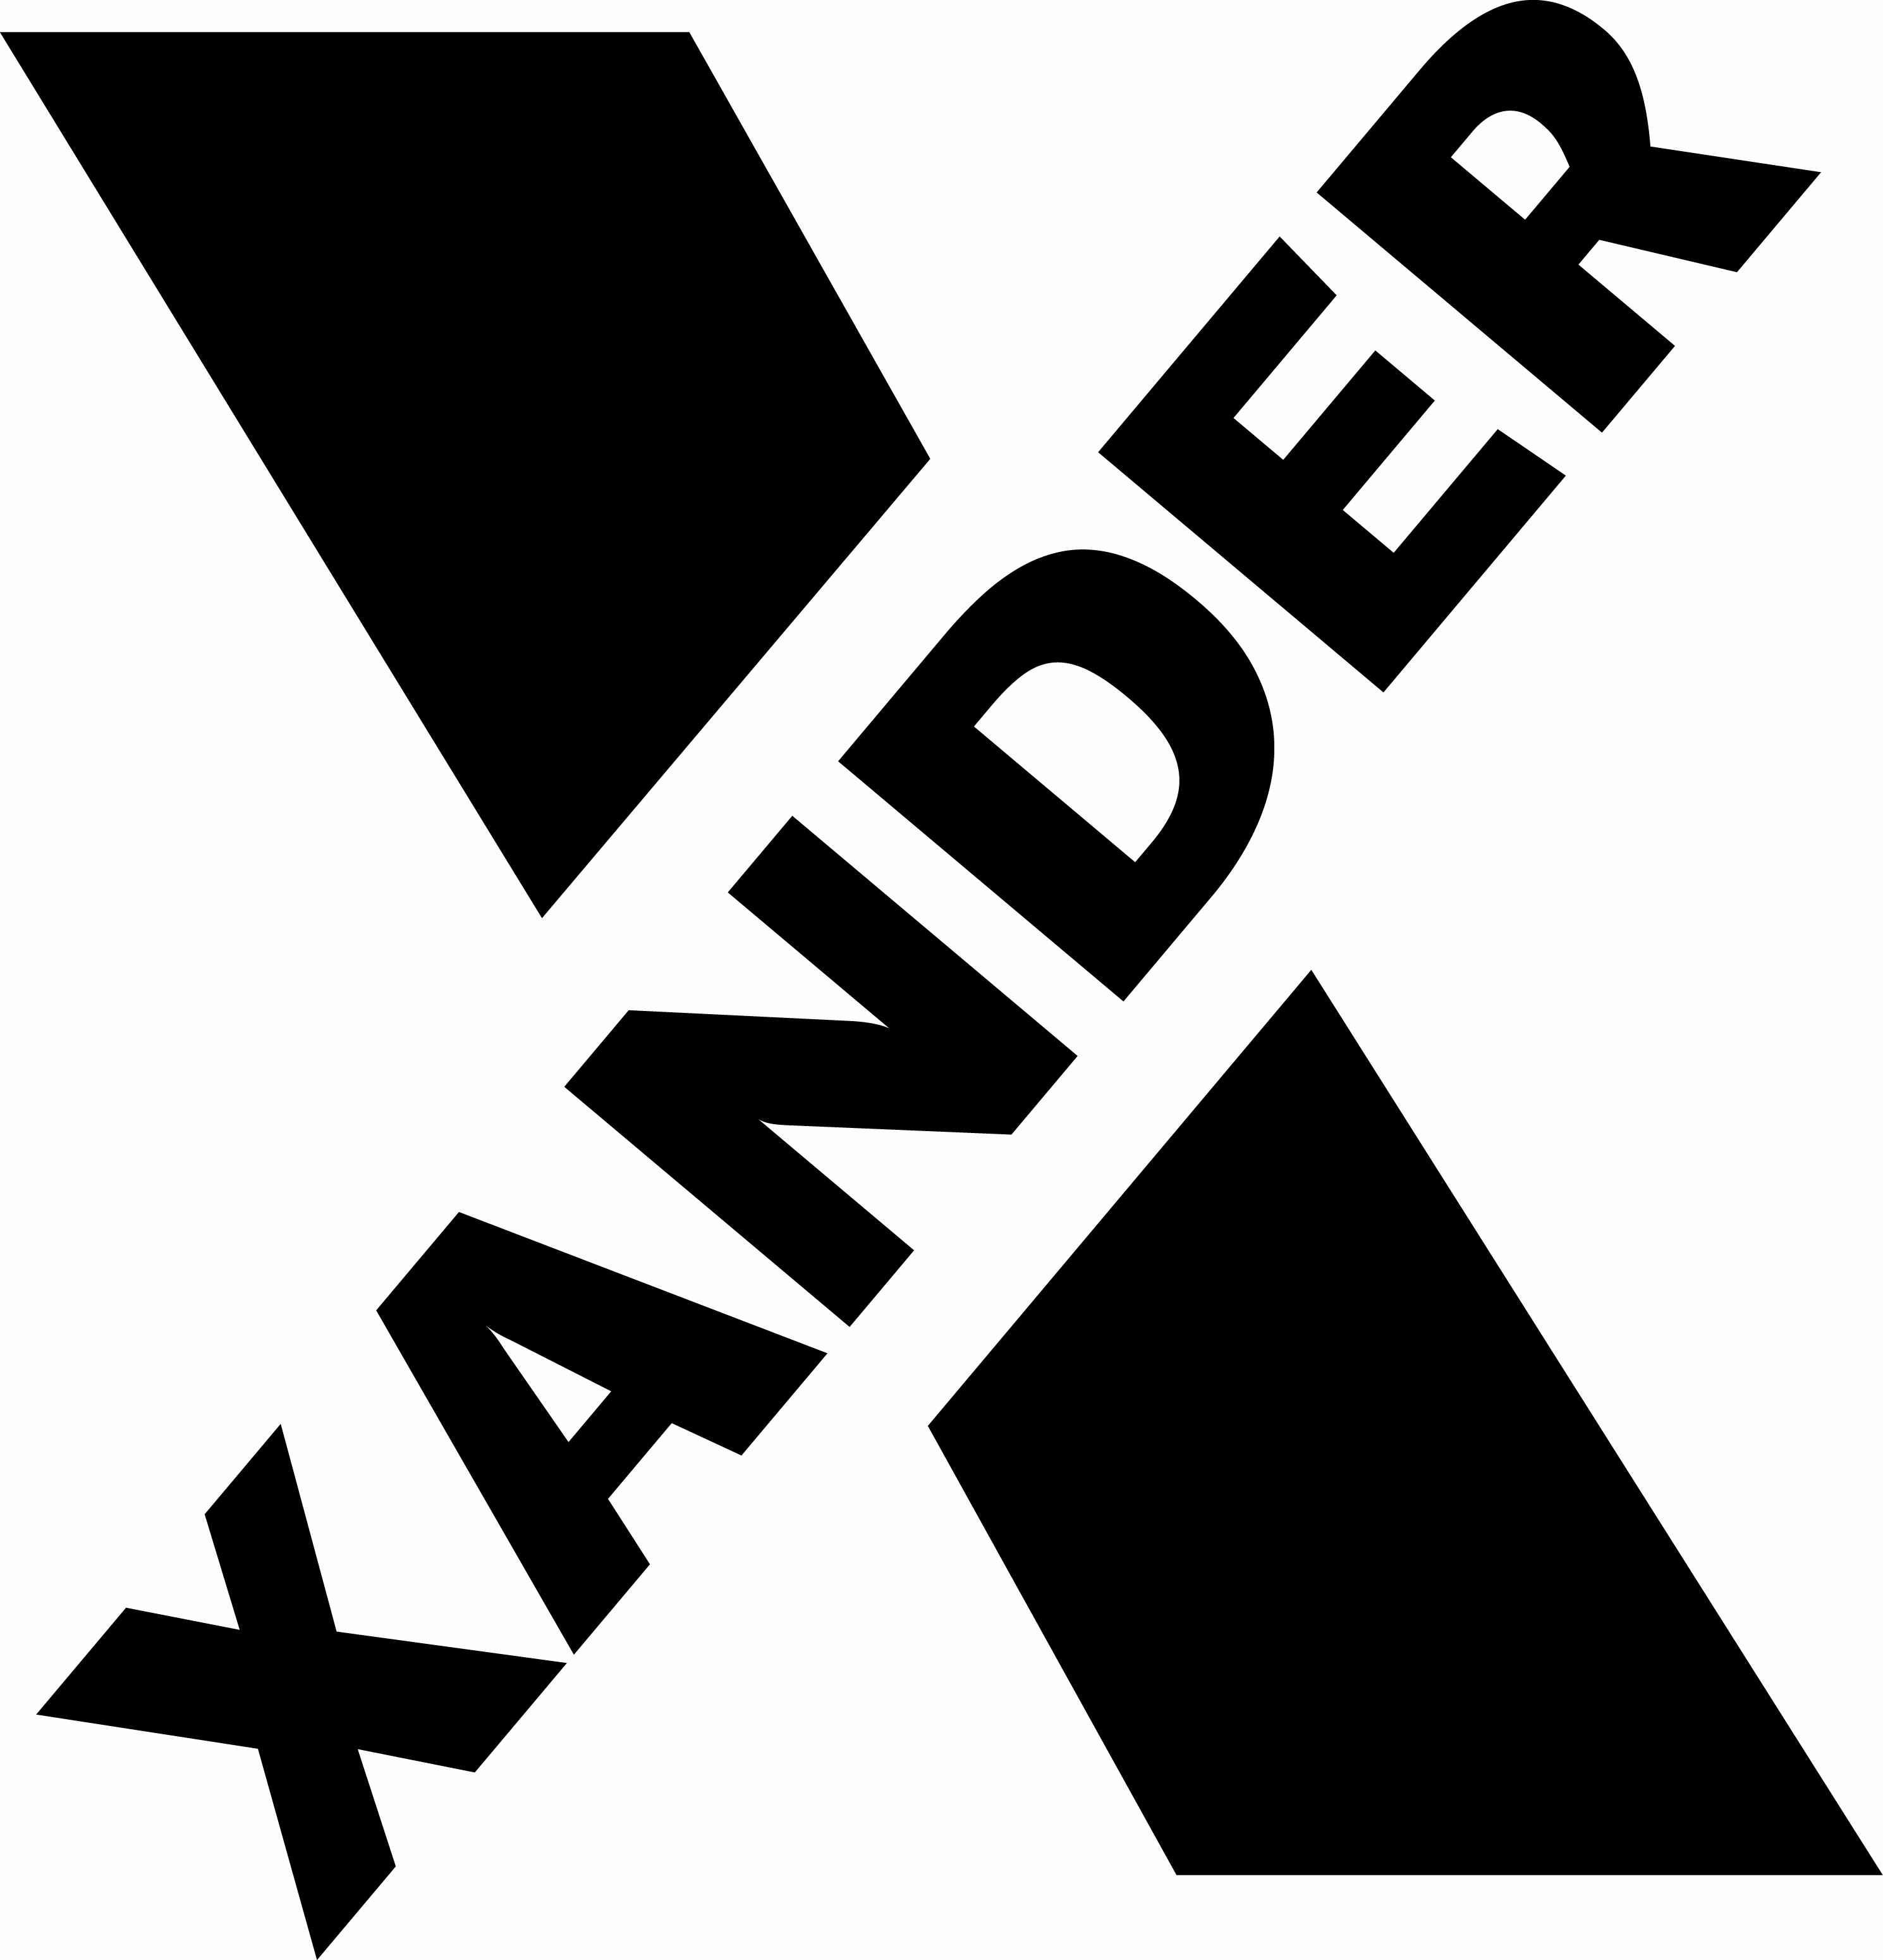 XANDER UITGEVERS B.V.